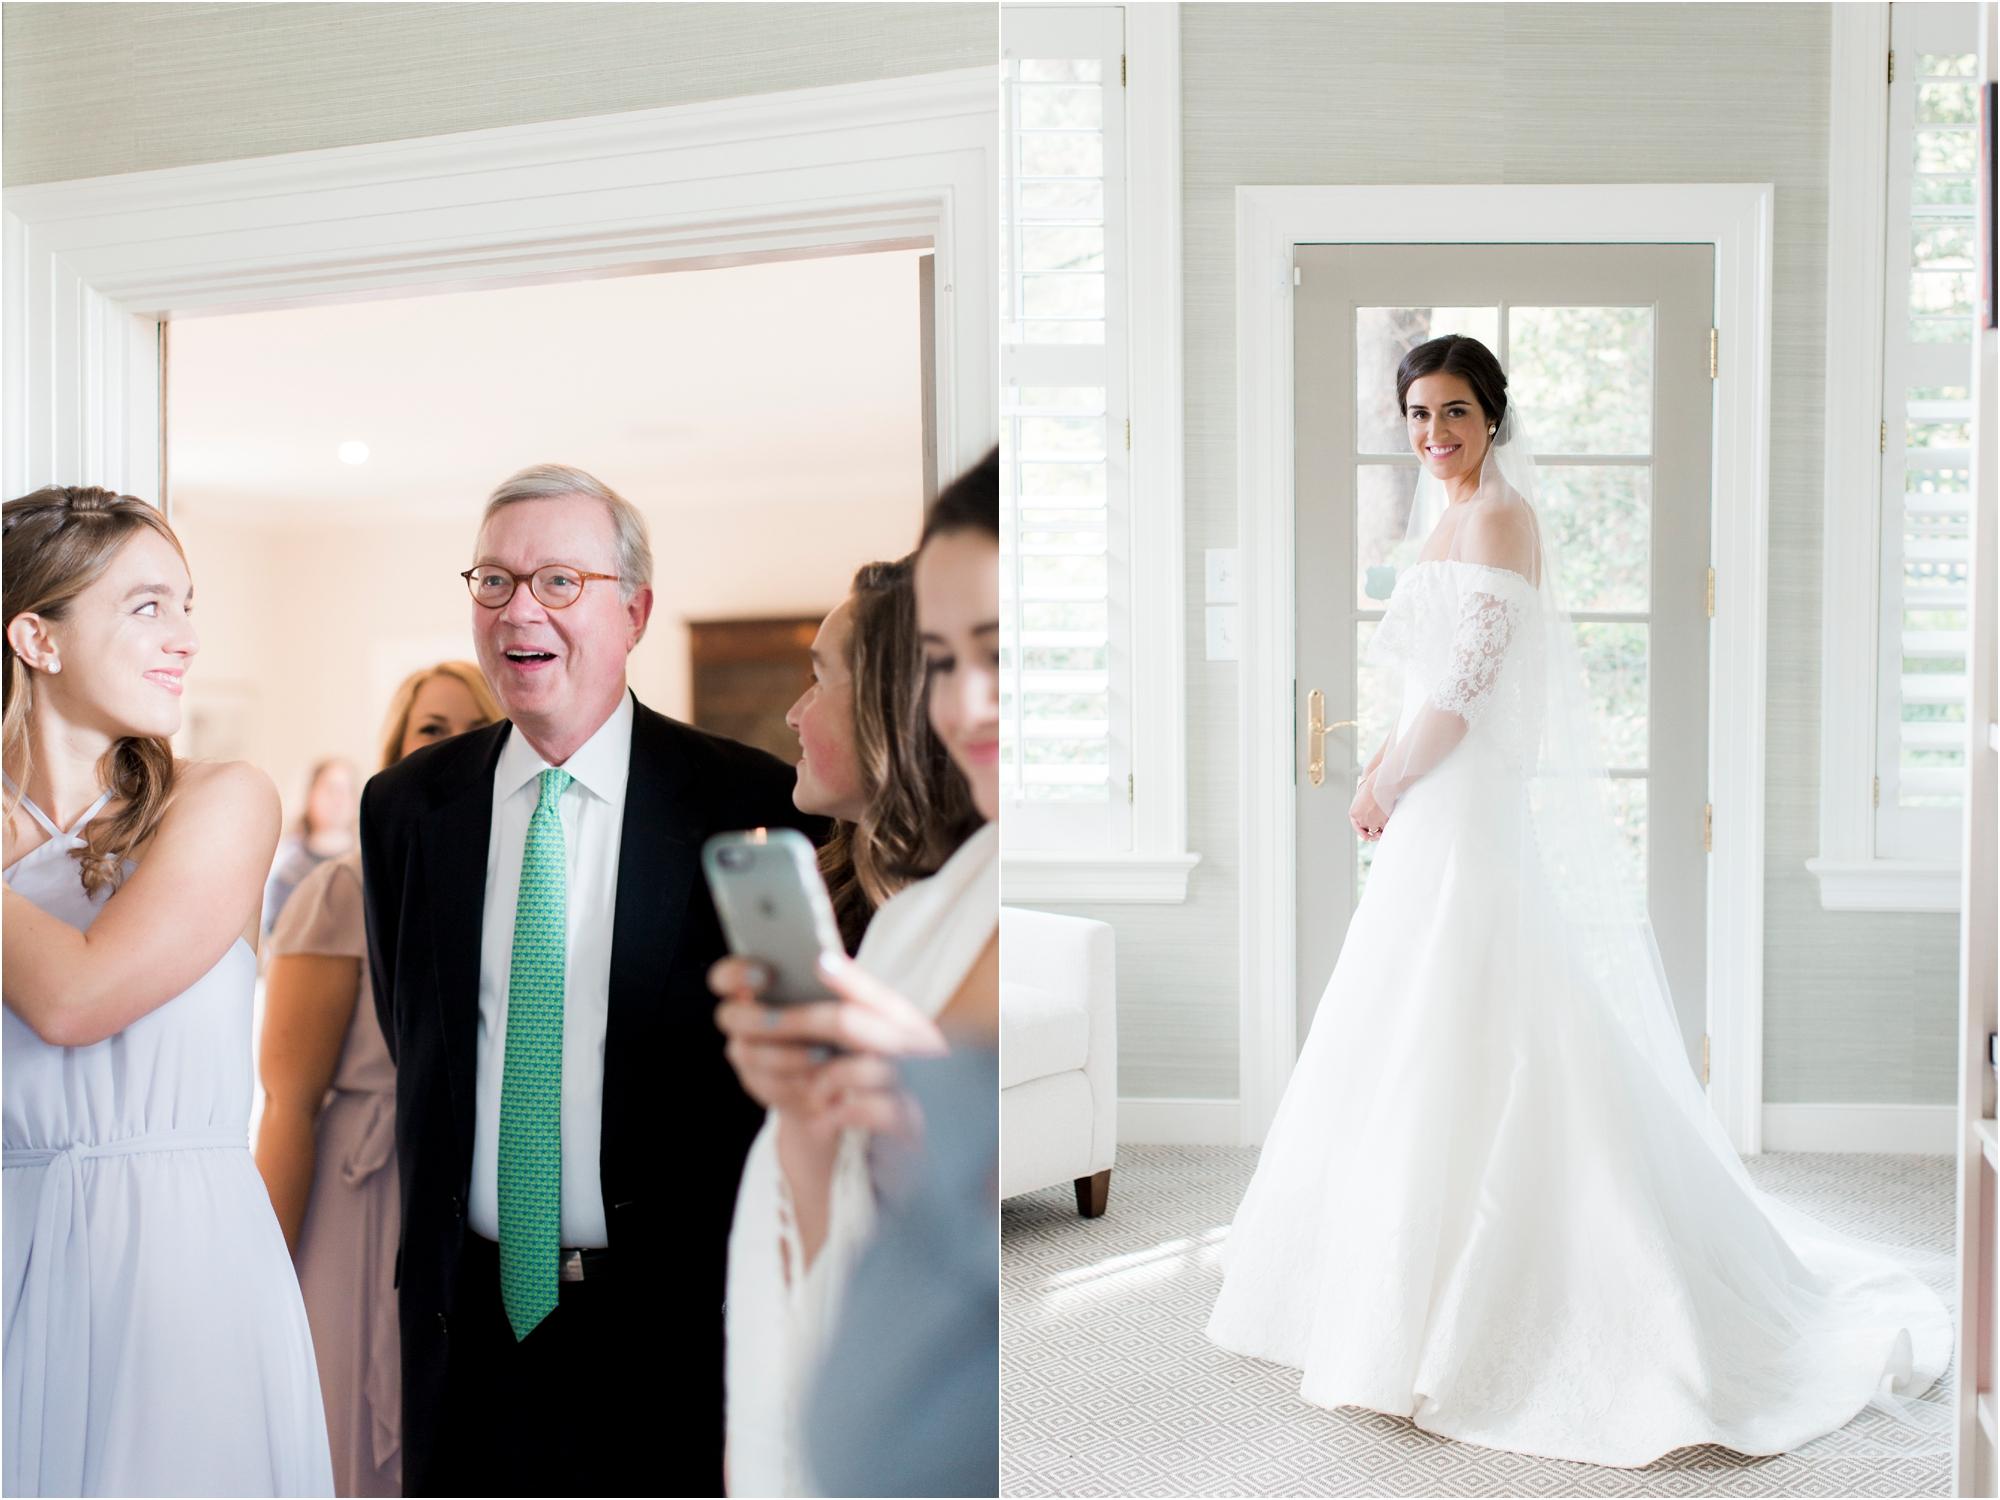 claire-thomas-farmington-country-club-charlottesville-virginia-wedding-photos_0008.JPG